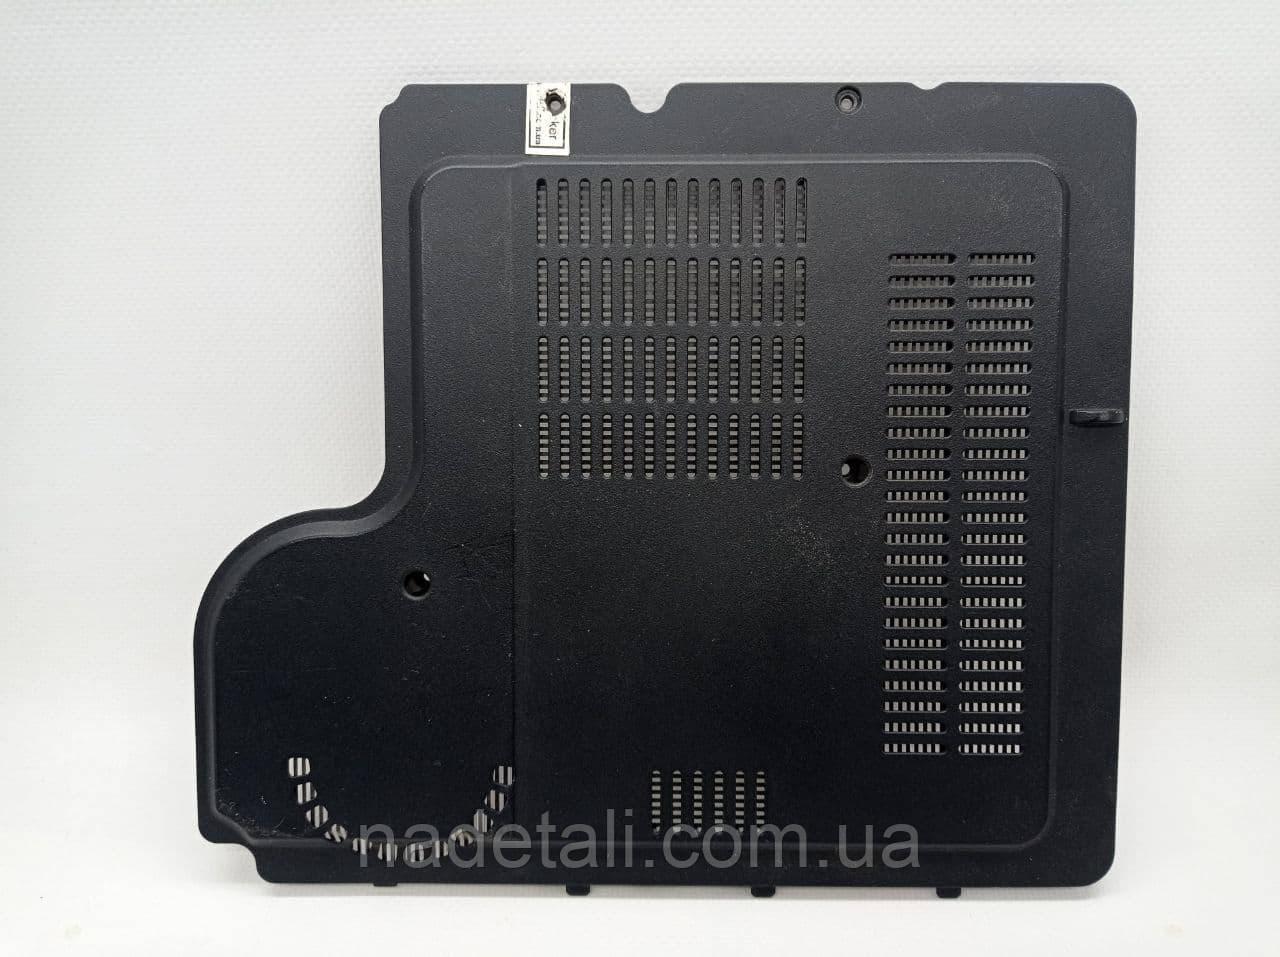 Сервисная крышка MSI GX610 307-631J201-Y31